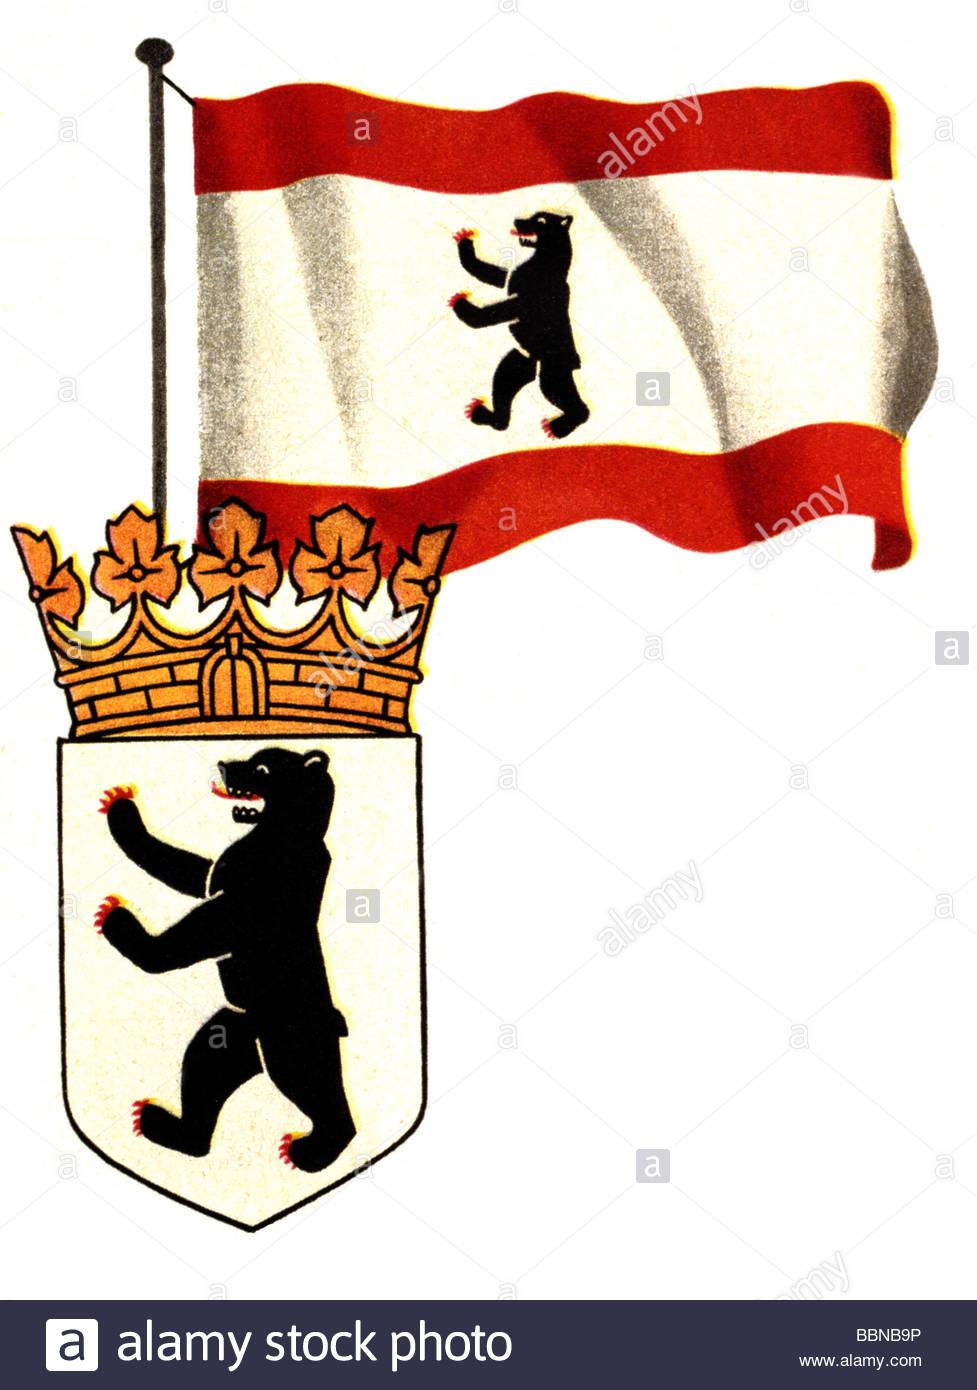 Berlin Bear Flag Stock Photos & Berlin Bear Flag Stock Images.